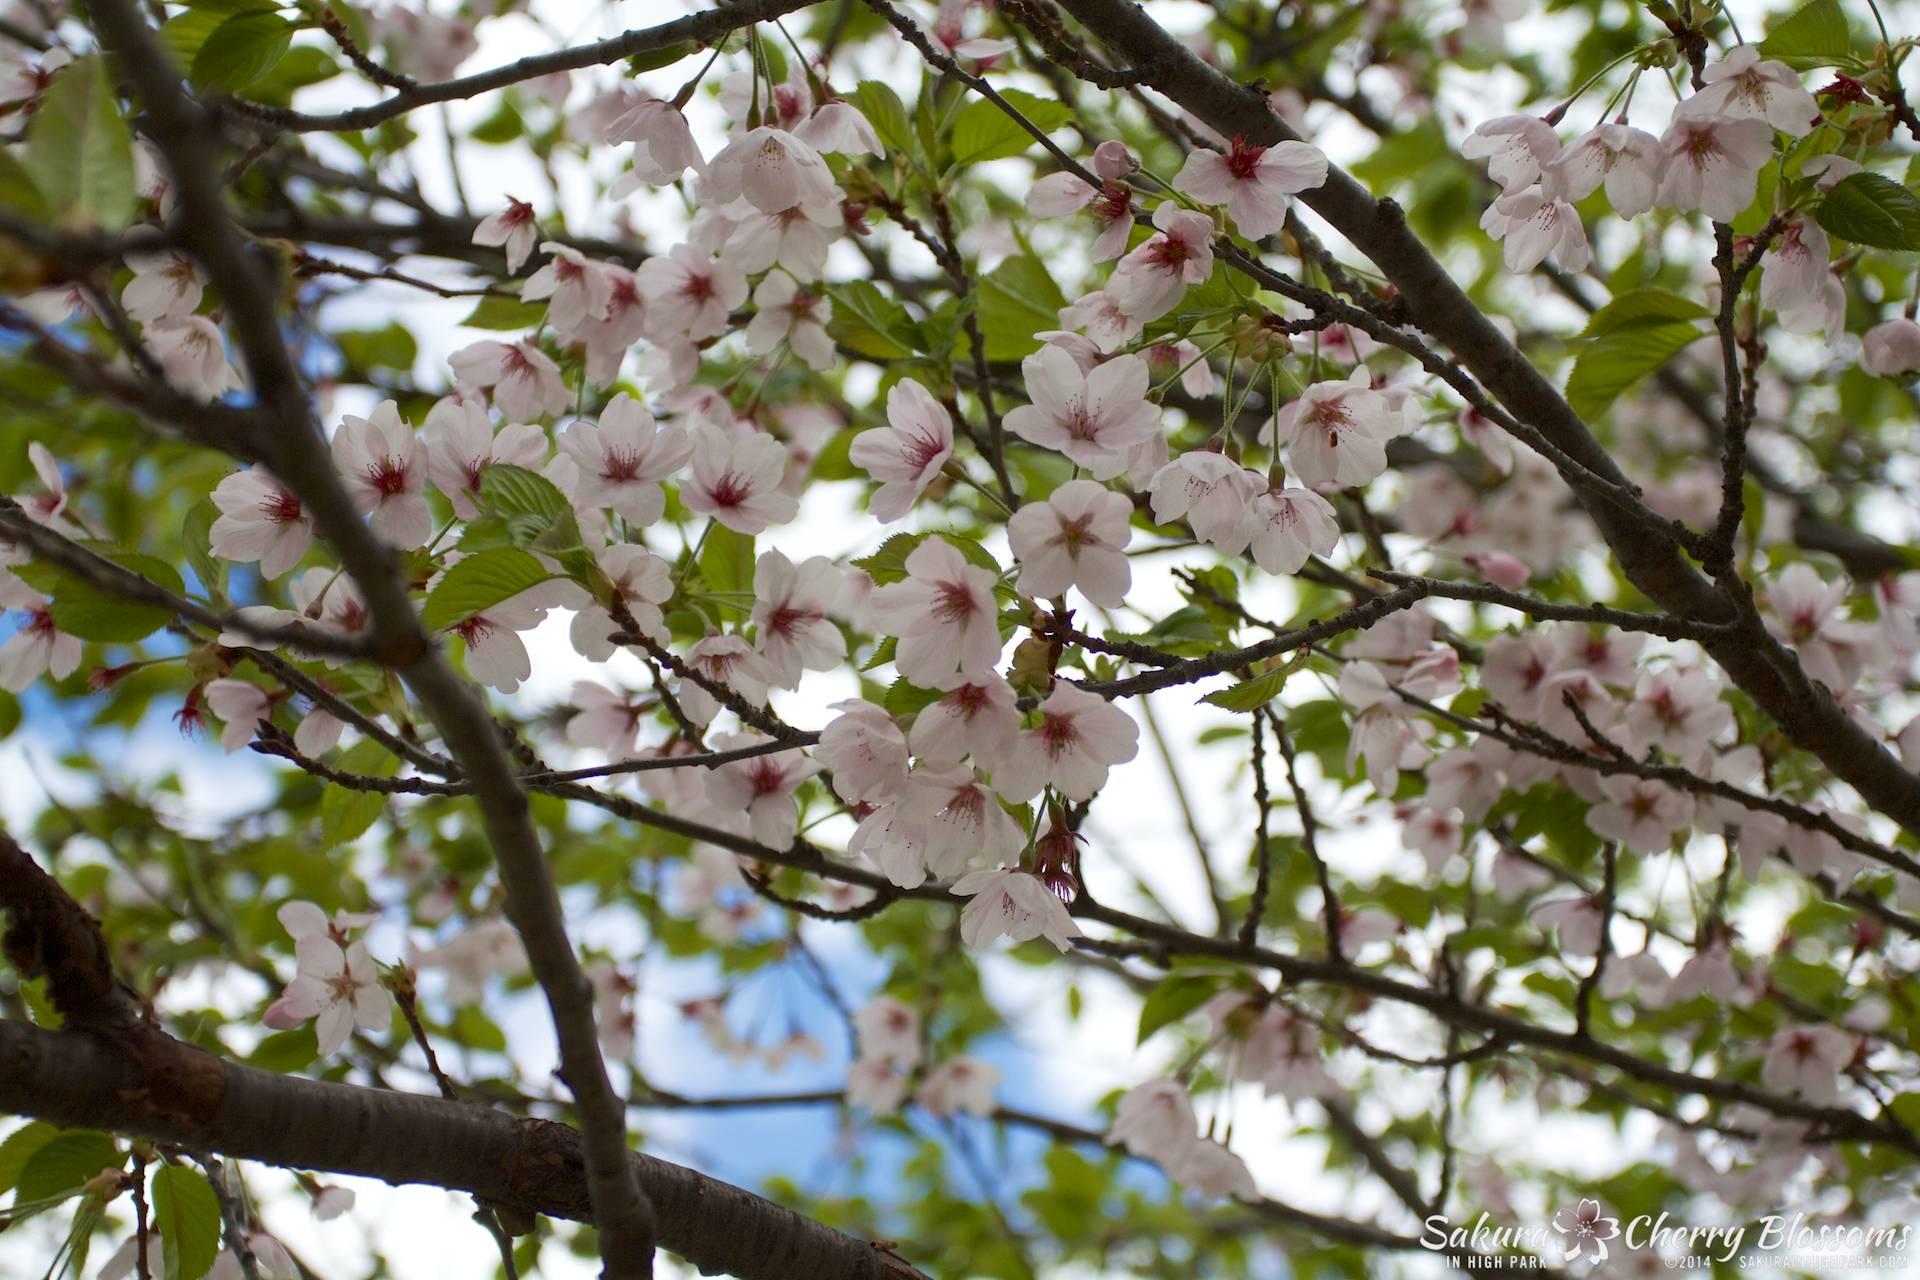 SakuraInHighPark-May1614-350.jpg